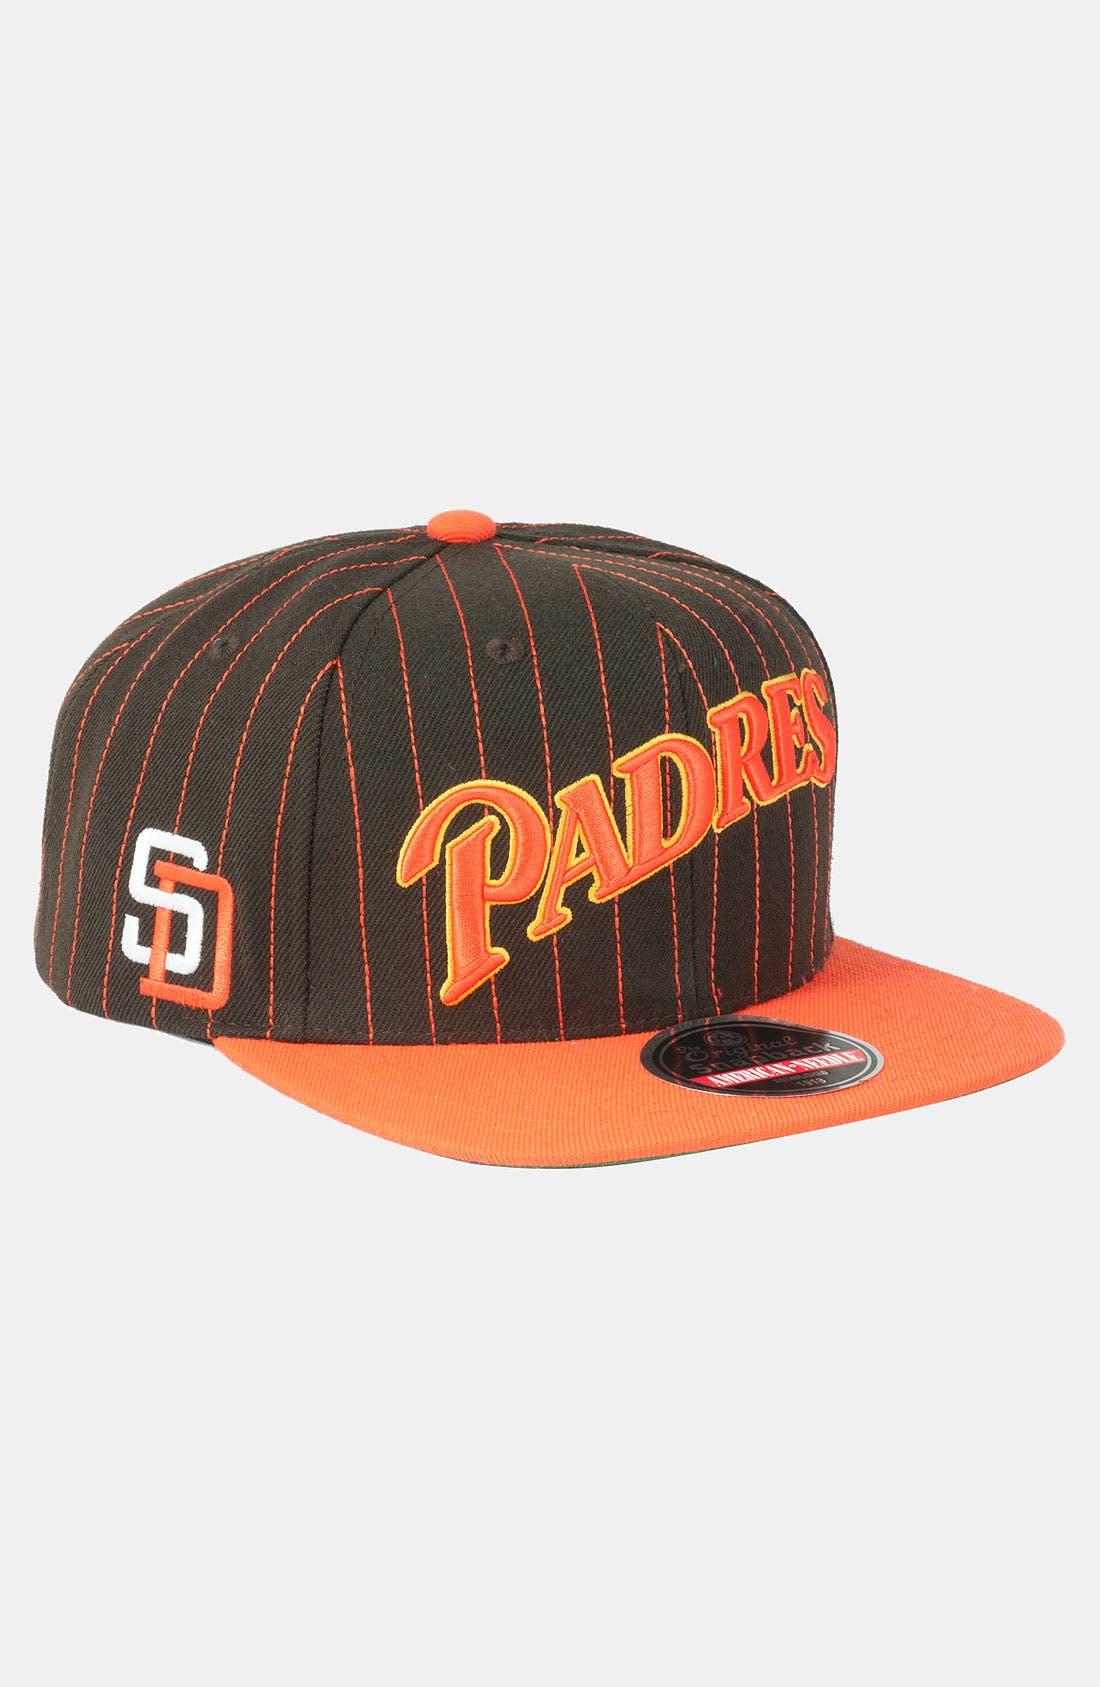 Alternate Image 1 Selected - American Needle 'Padres' Snapback Baseball Cap